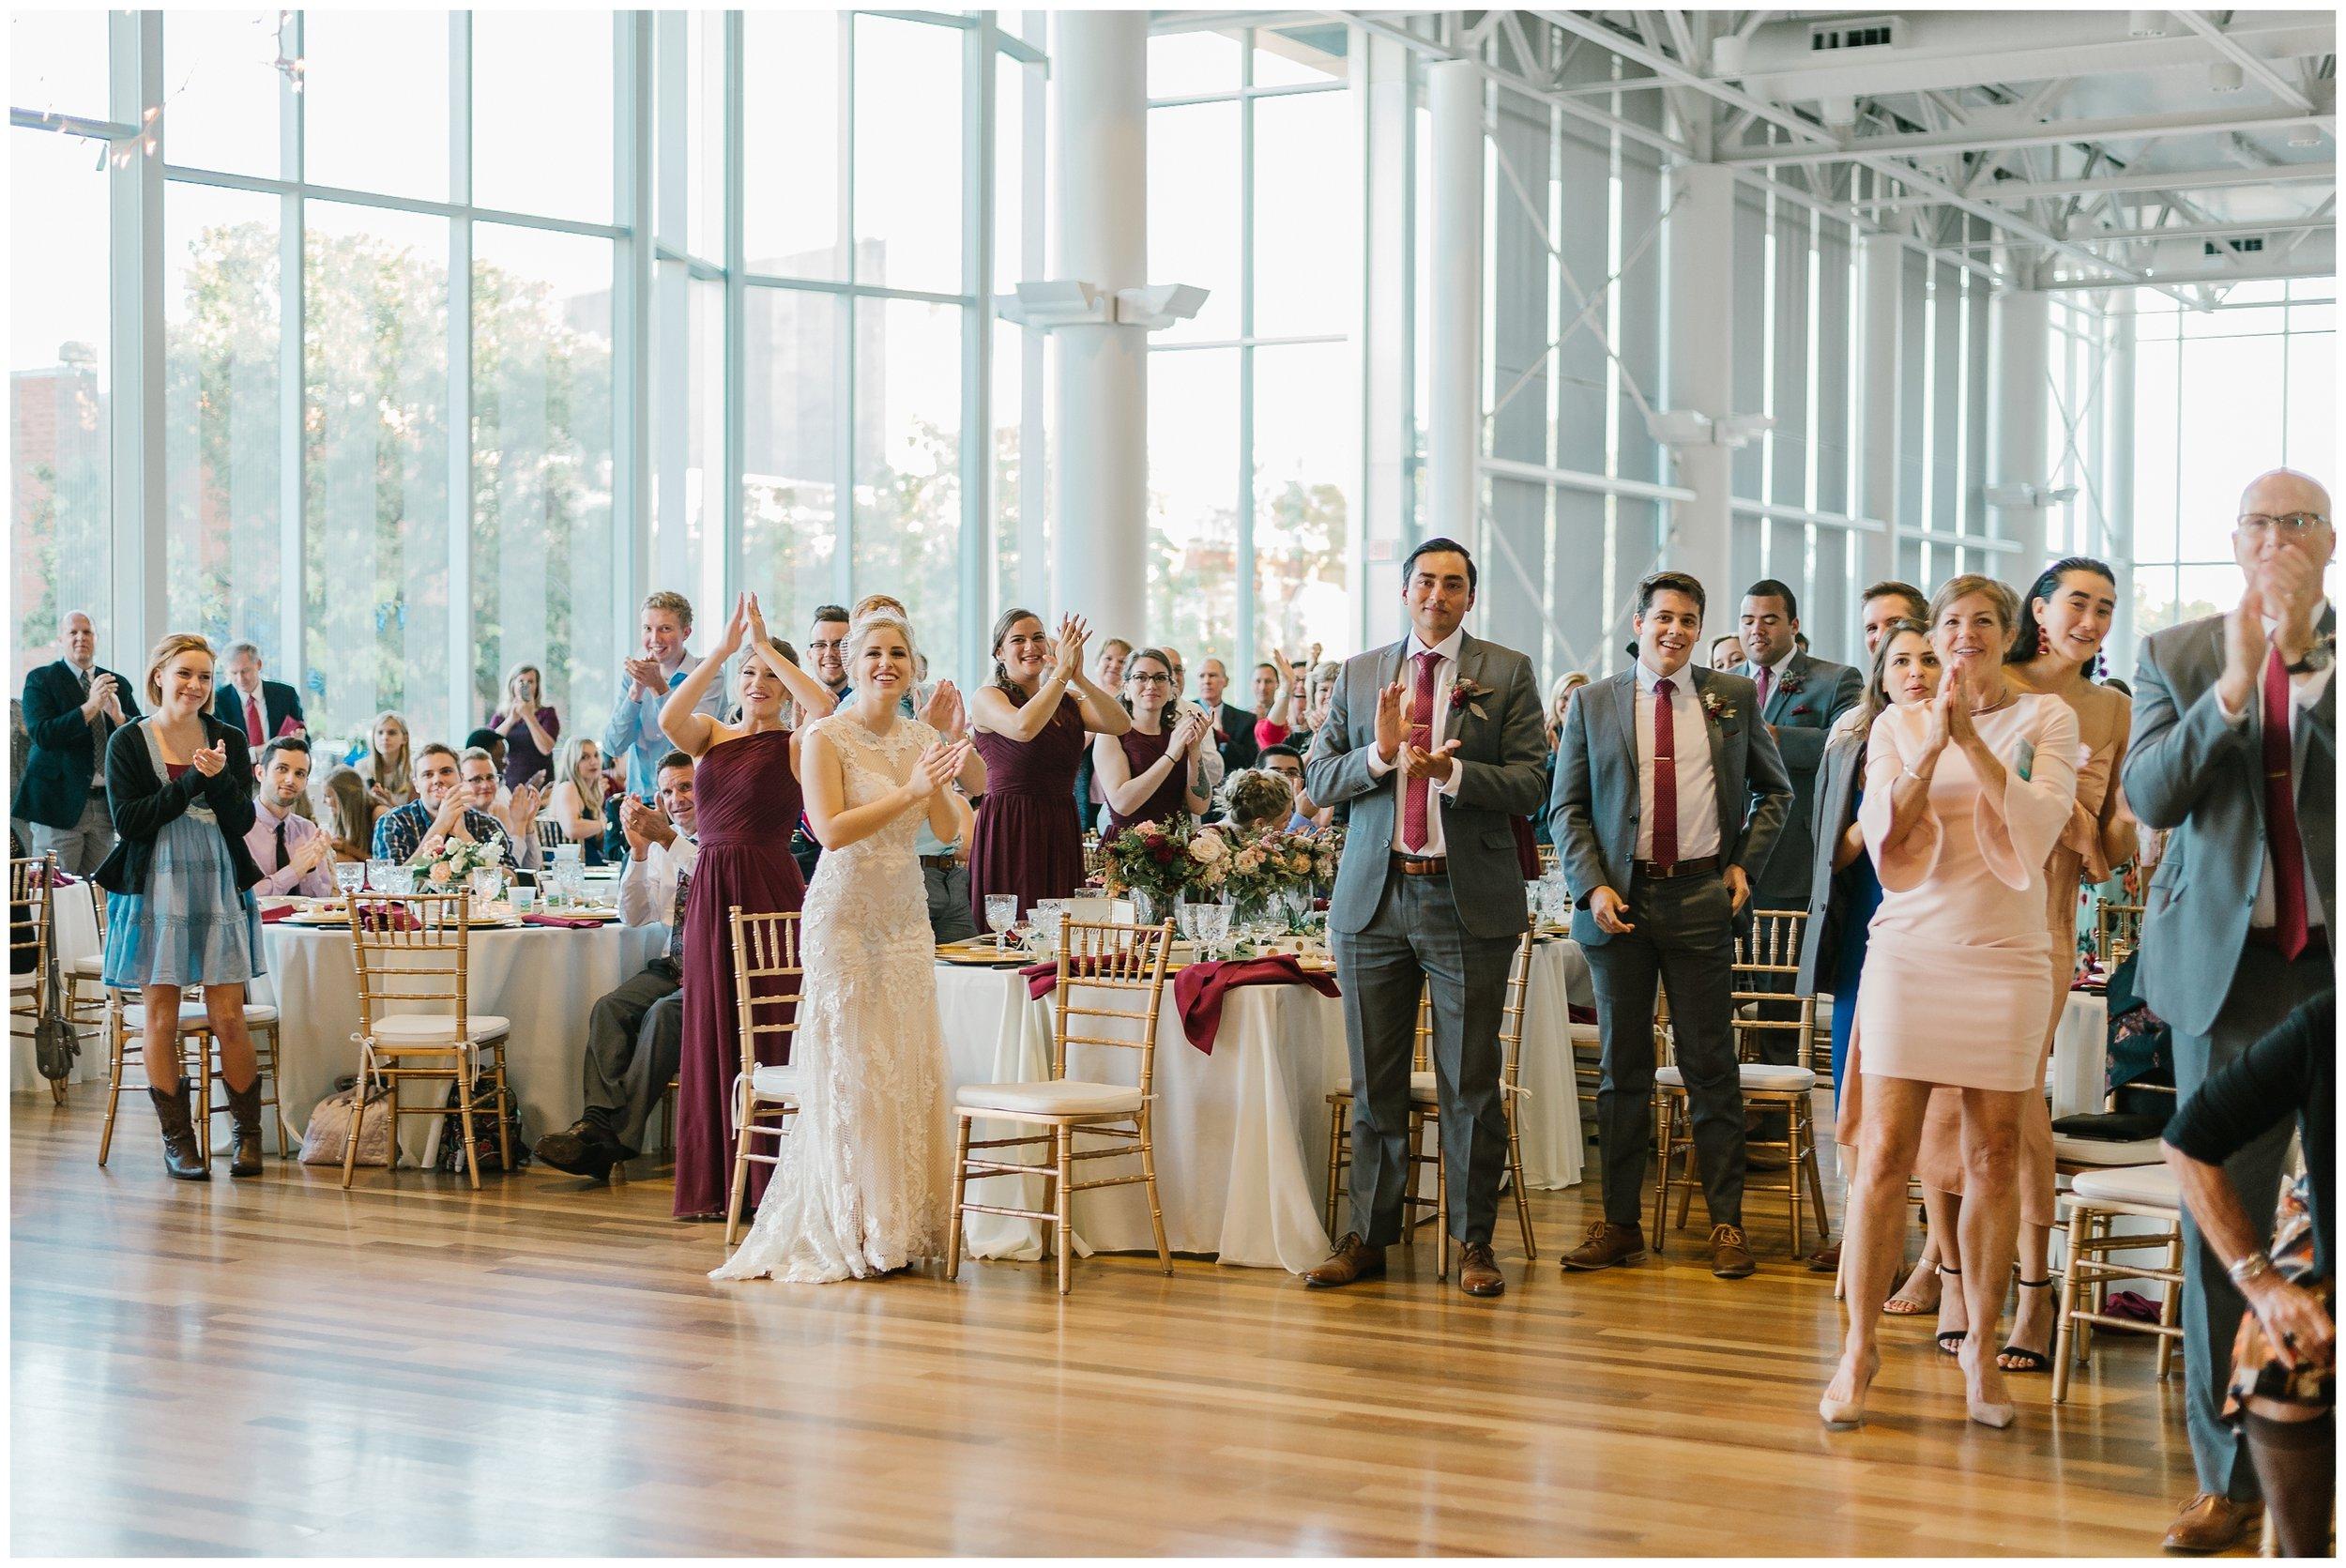 Rebecca_Shehorn_Photography_Indianapolis_Wedding_Photographer_7380.jpg